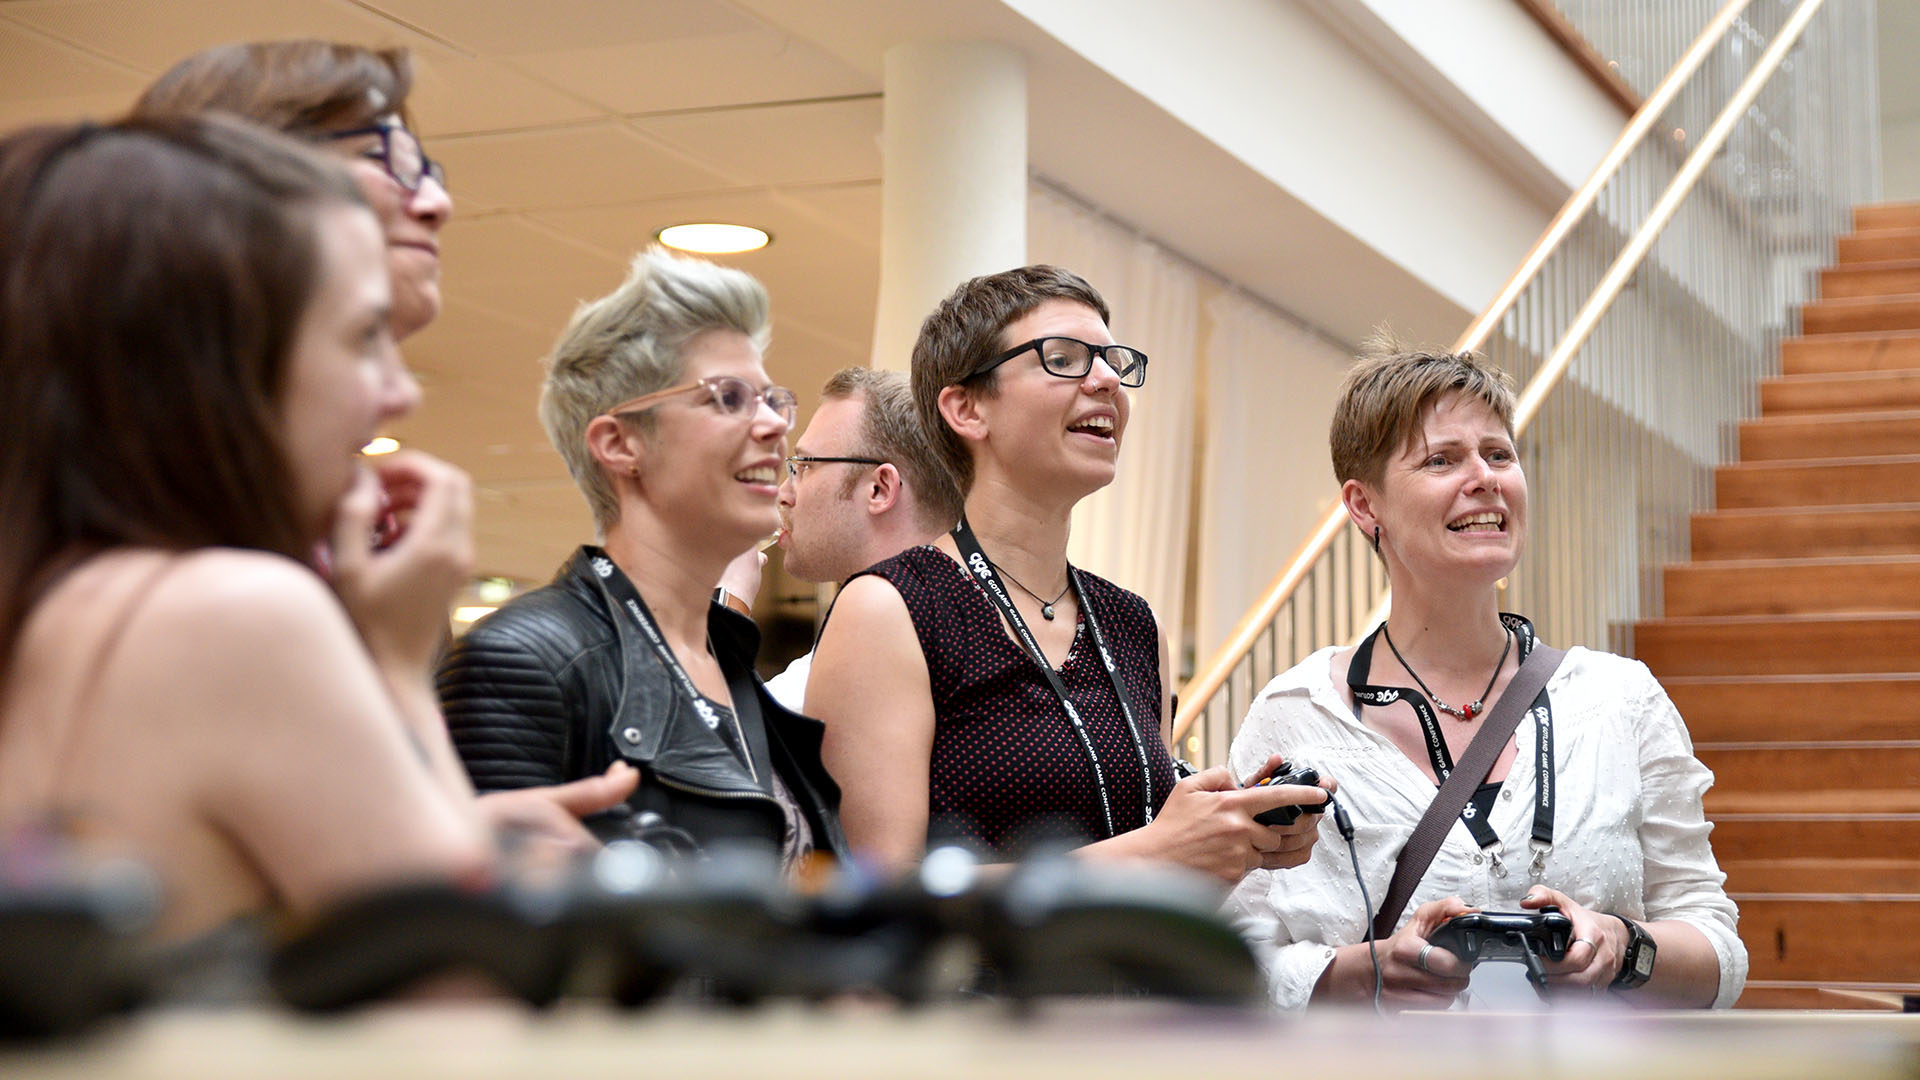 Prof. Doris Rusch, Dr. Sabine Harrer and addiction councelor Martine Pedersen – three jurors hard at work at the GGC 2017